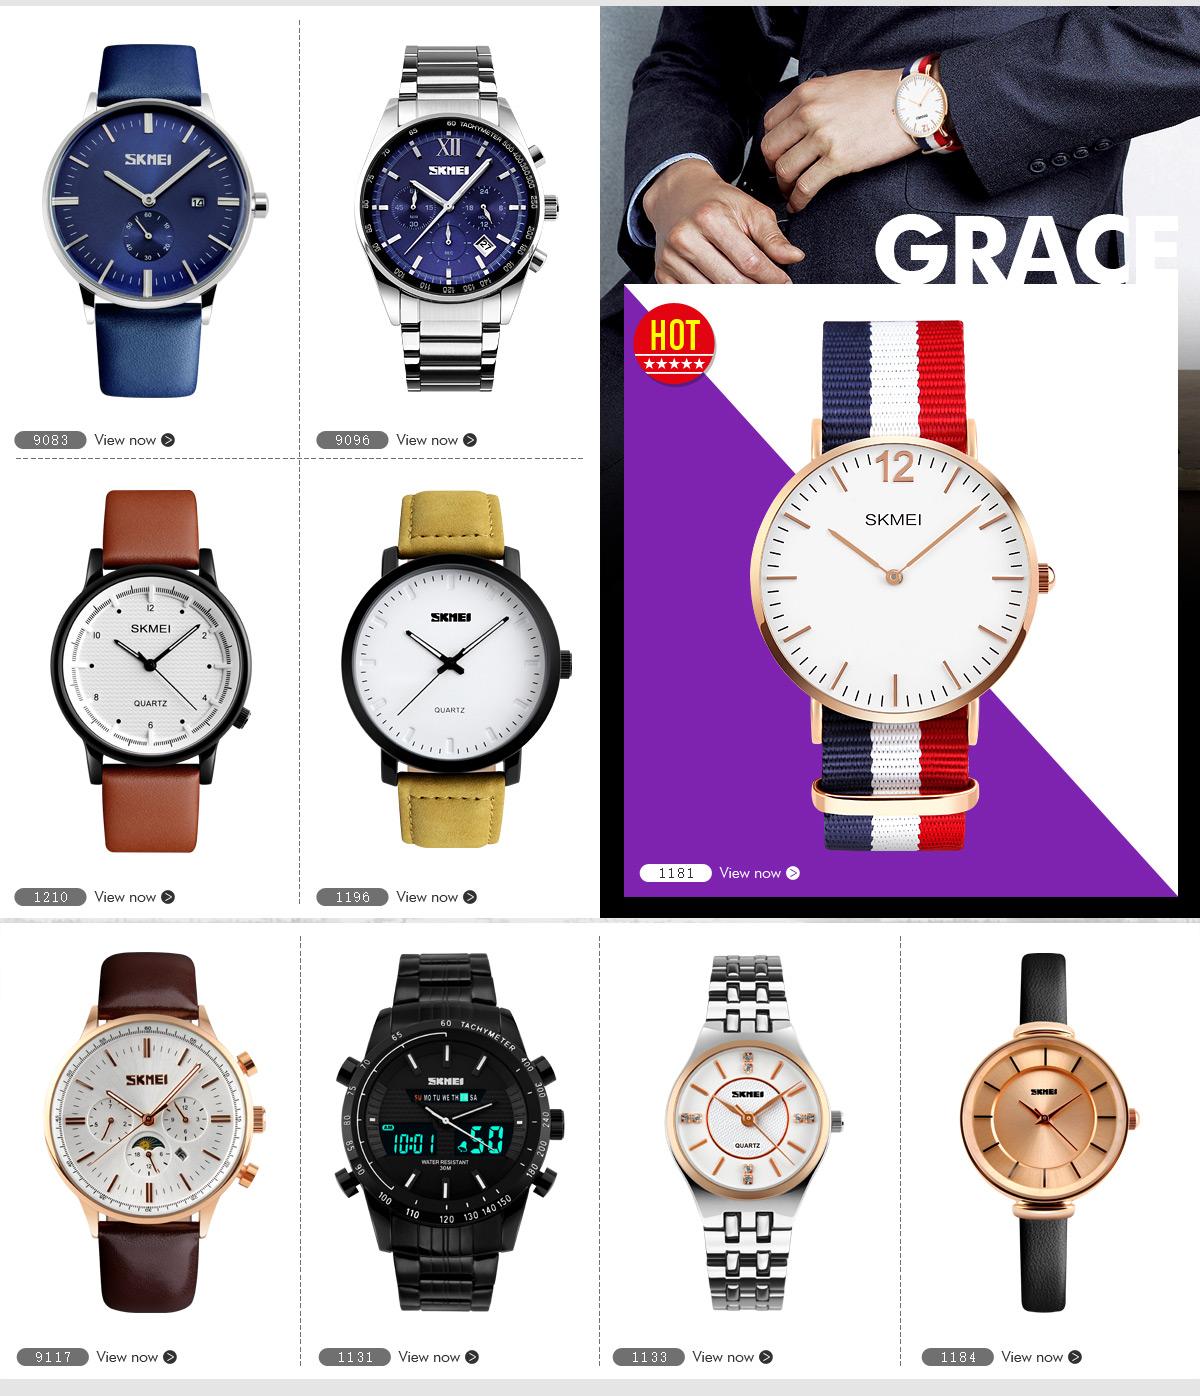 Guangzhou Skmei Watch Co Ltd Wristwatches Digital Jam Tangan Pria 9106 Original Water Resistant Black Red Henry Chen